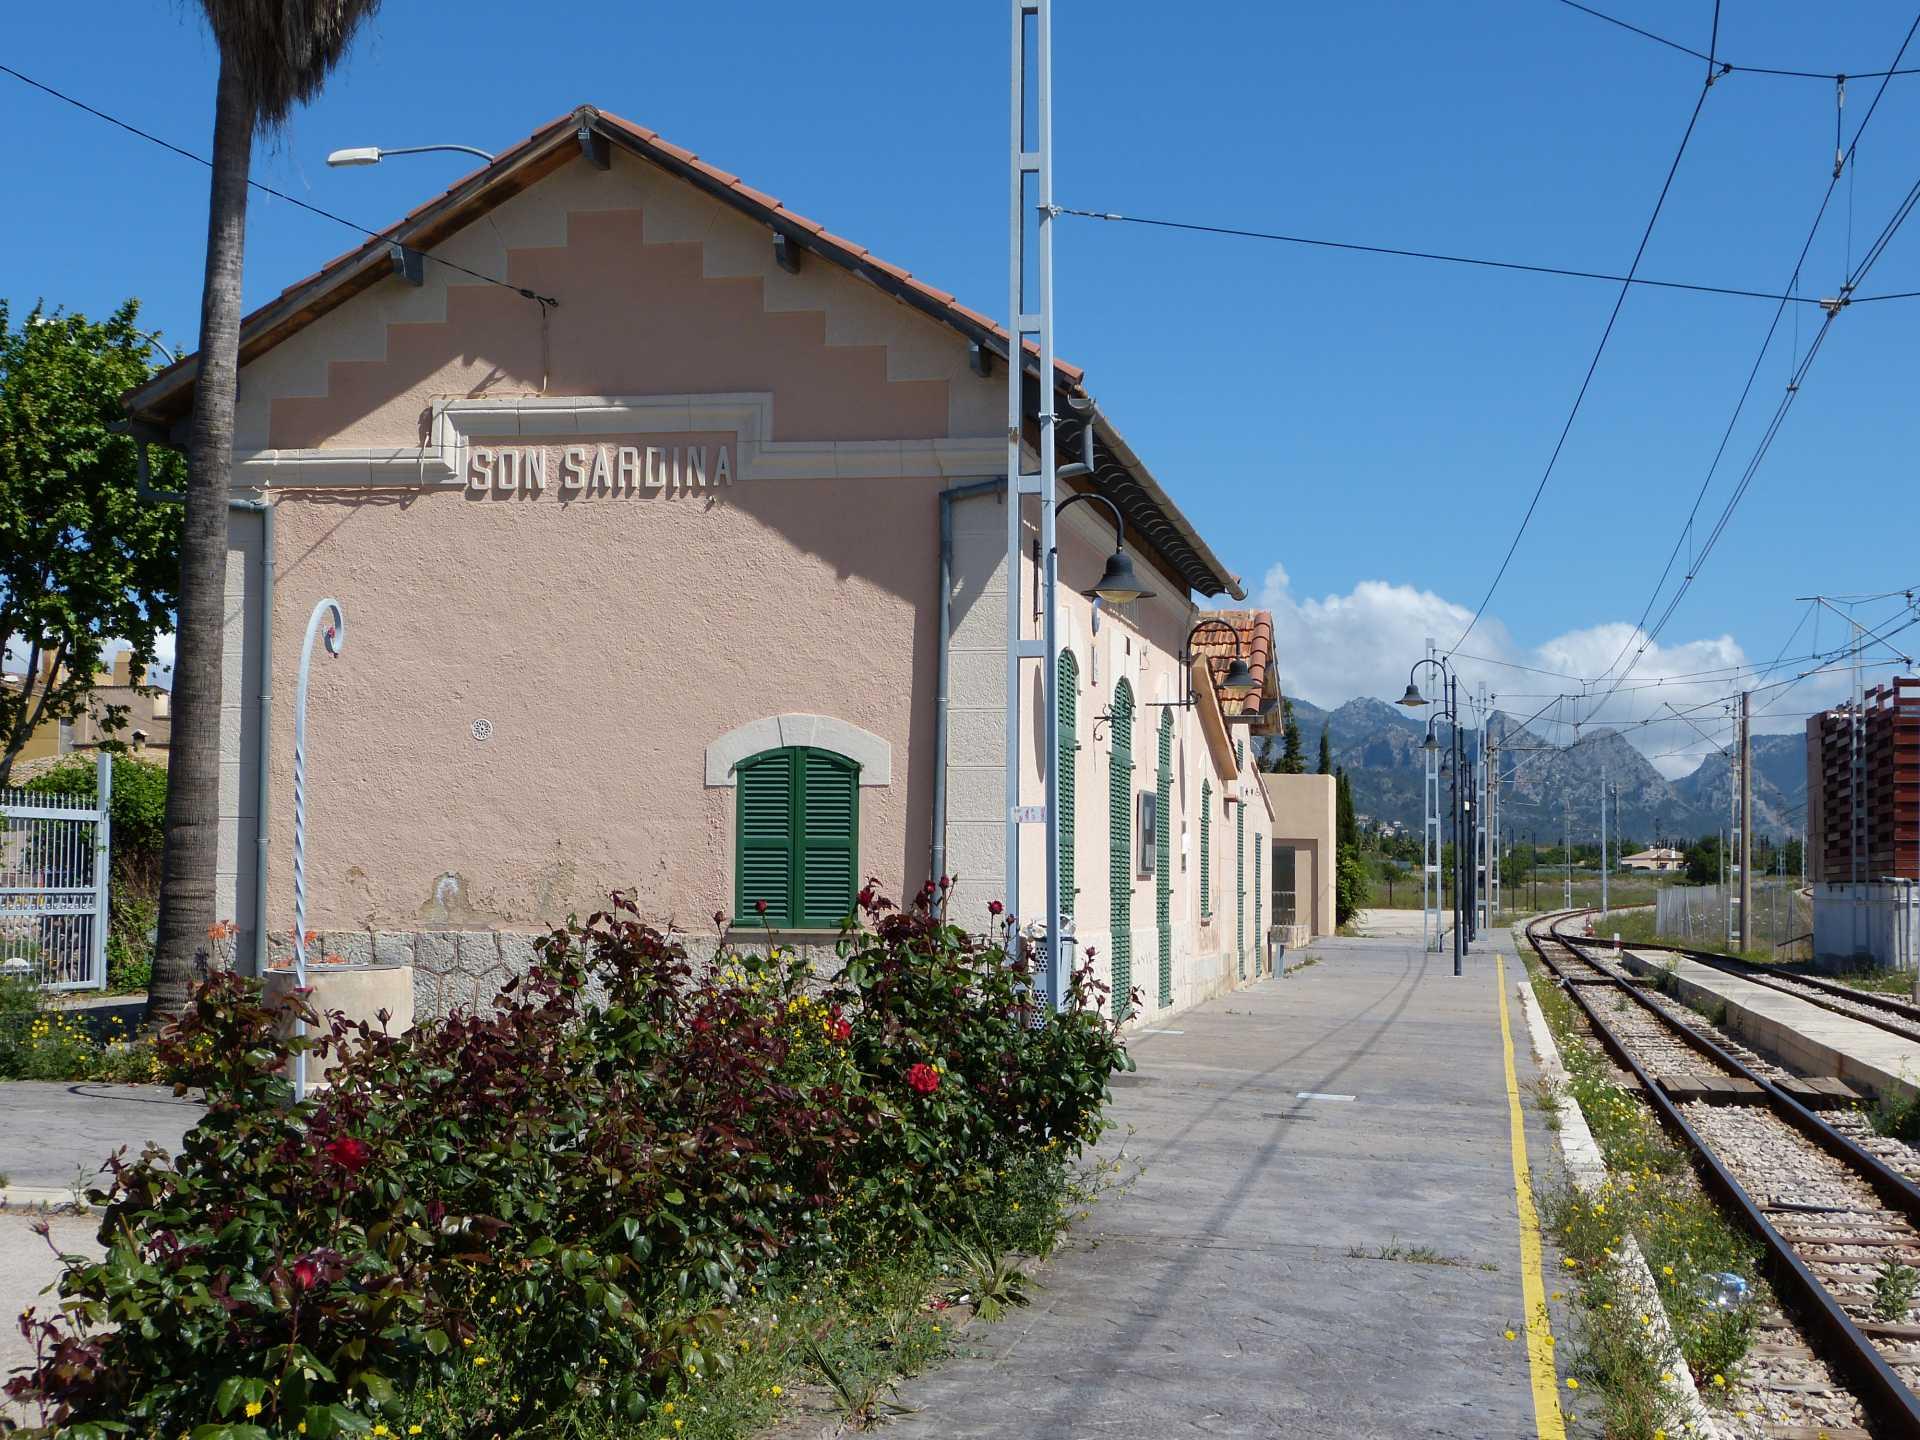 Park and Ride Bahnhof